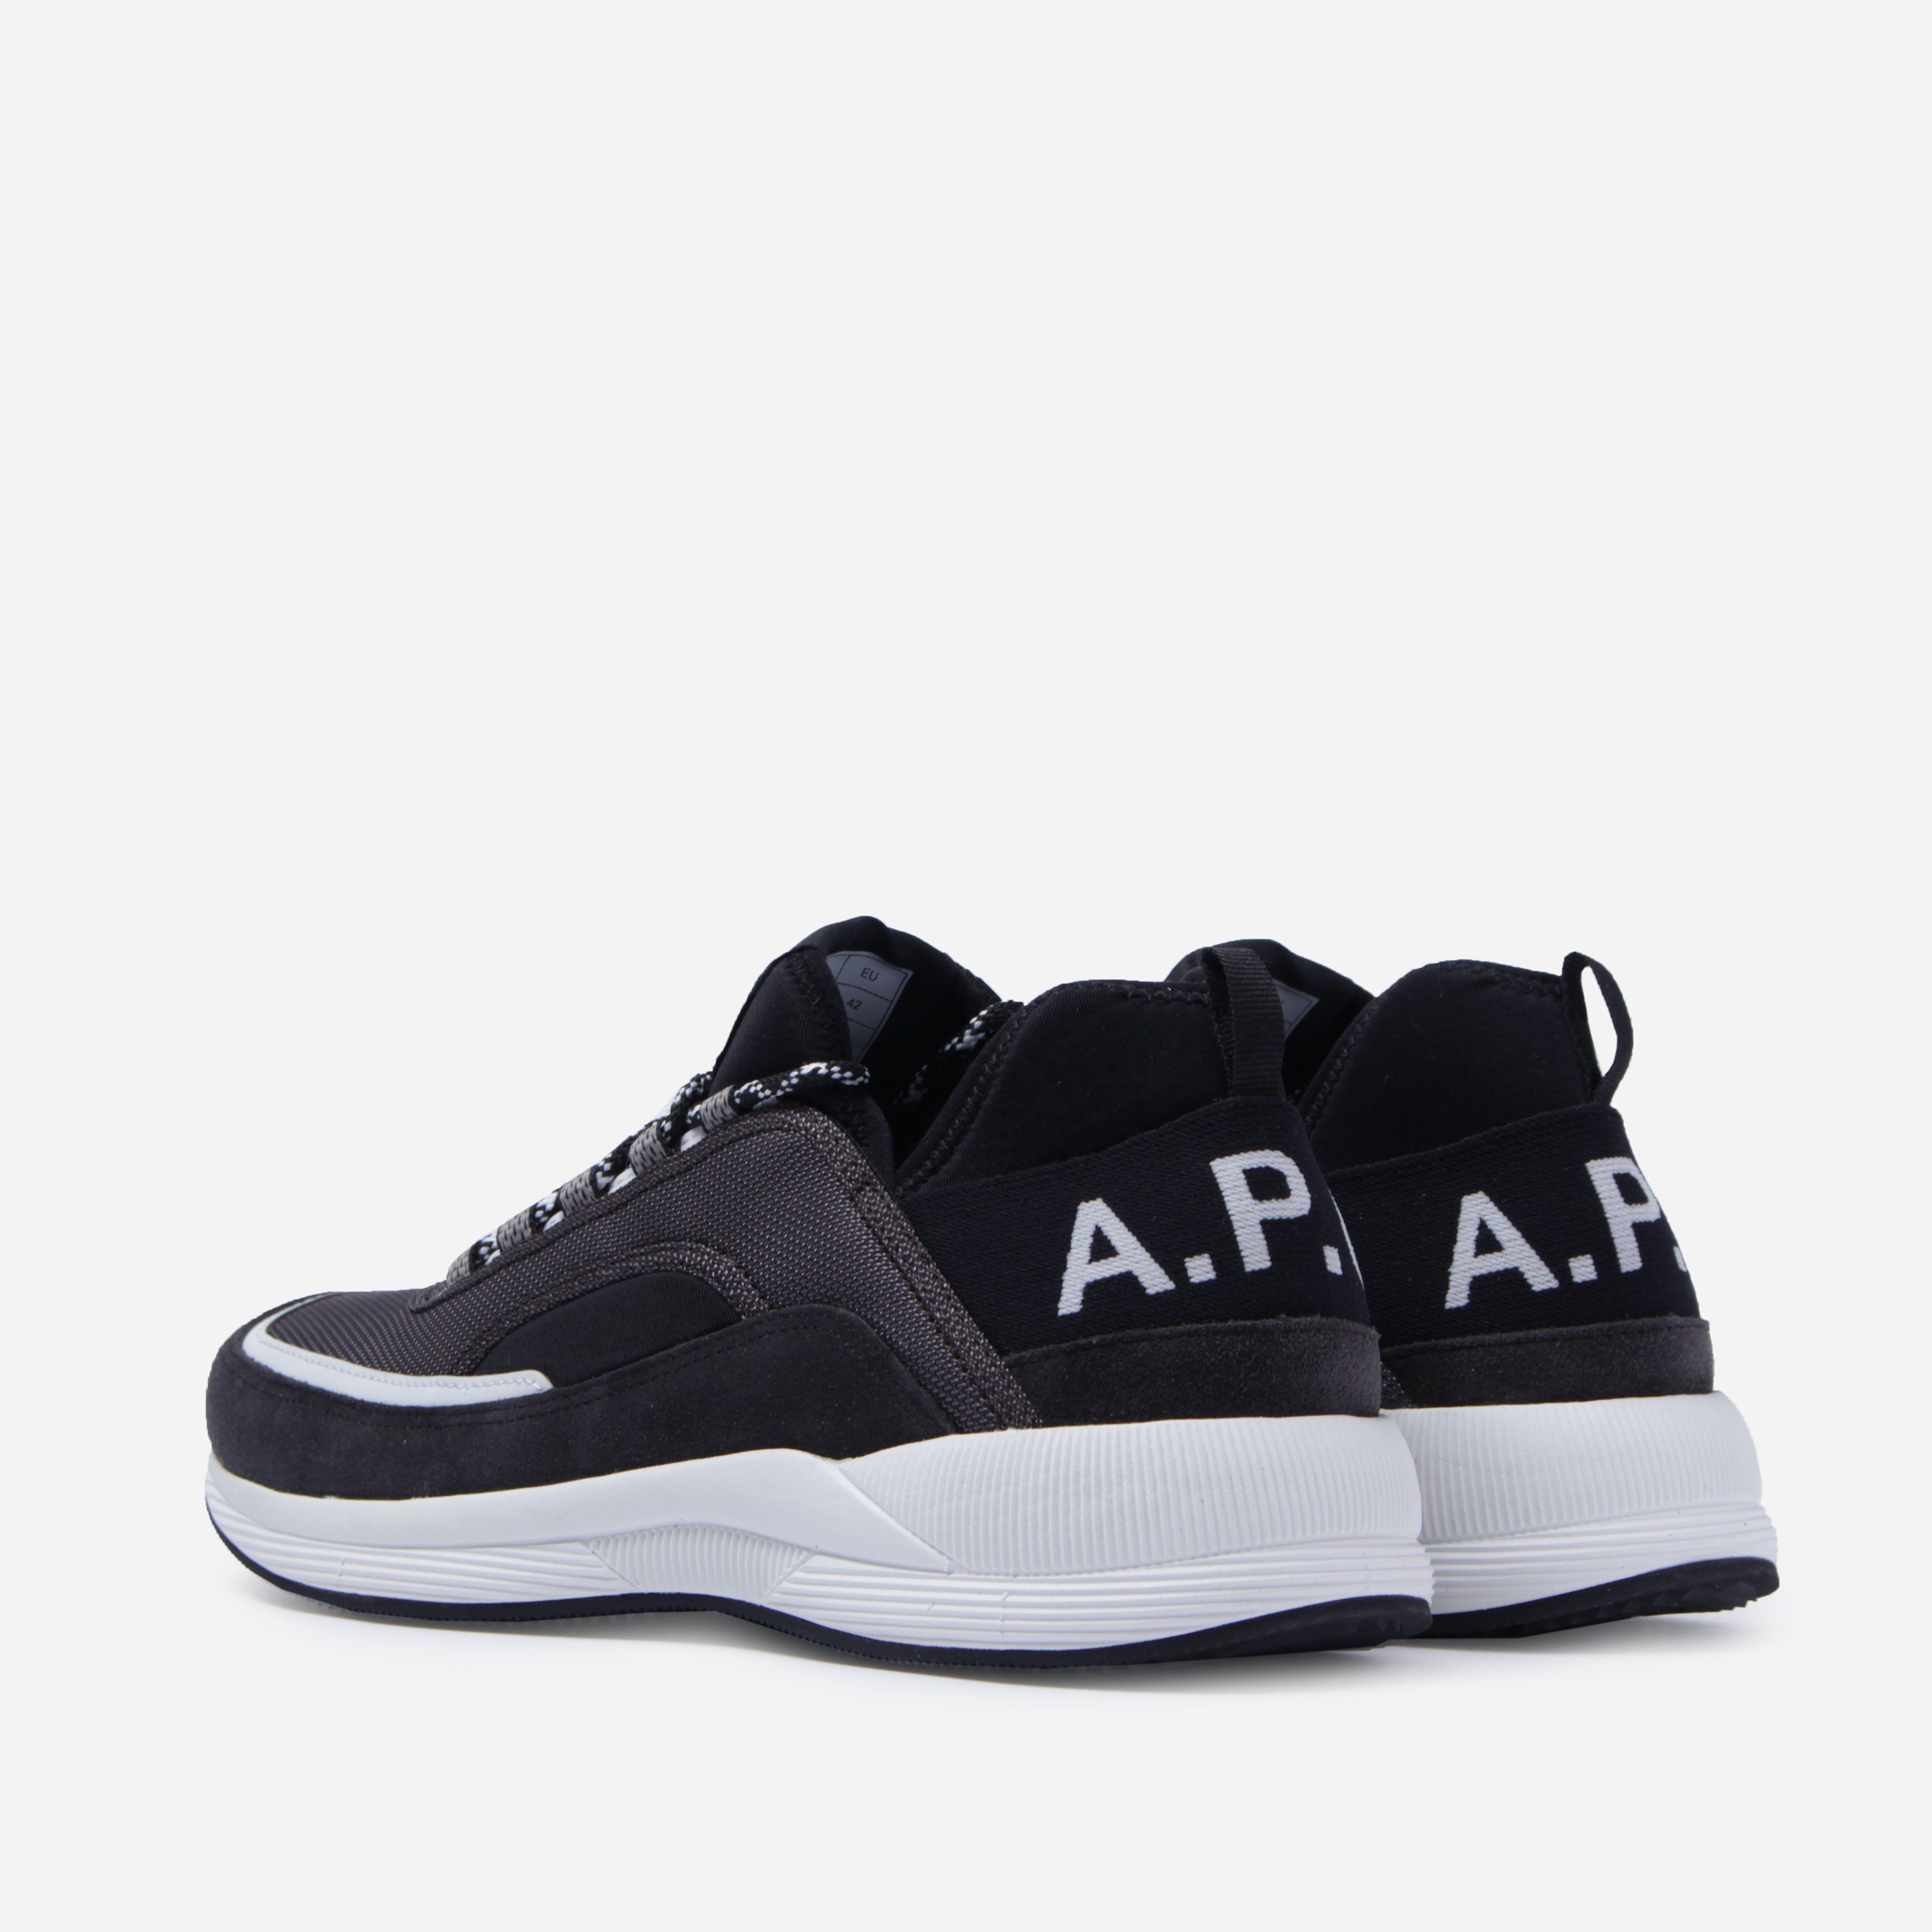 A.P.C. Alexander Sneakers